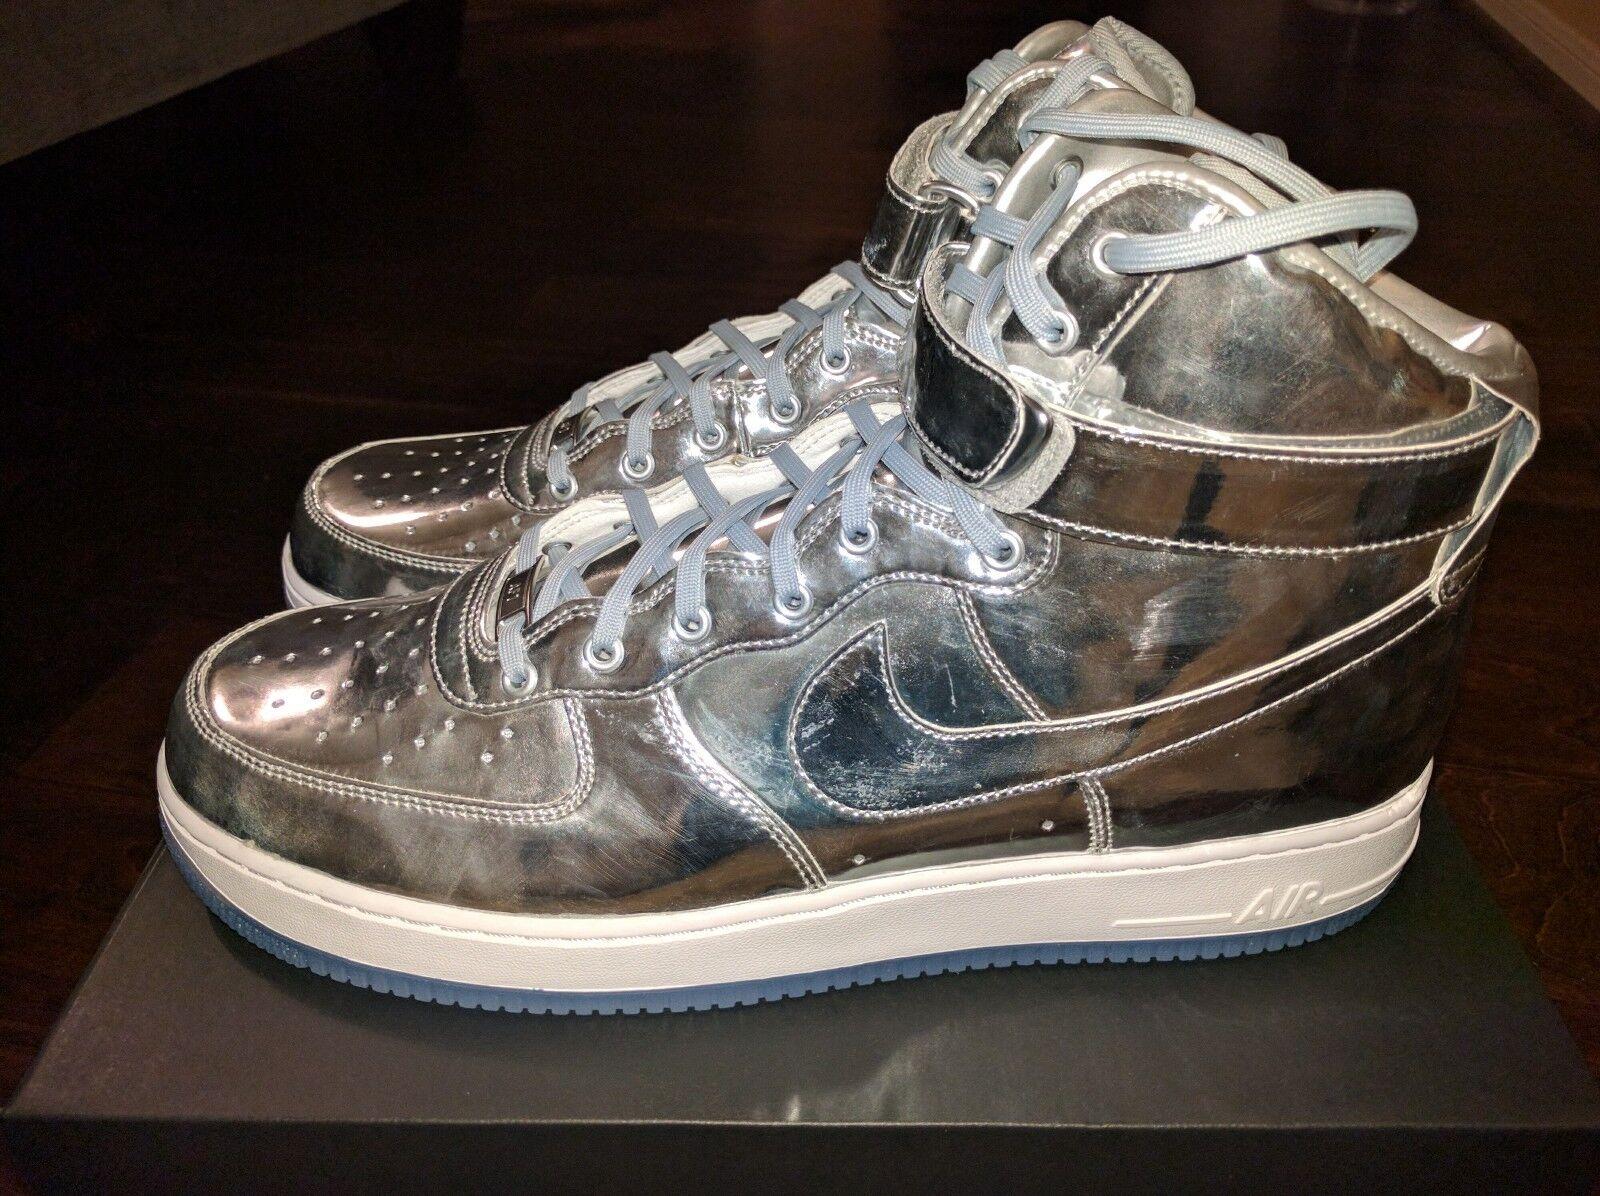 Nike Air Force 1 High Blanco Premium id Liquid Plata Blanco High Metallic Jordan off SF 15 gran descuento f49022